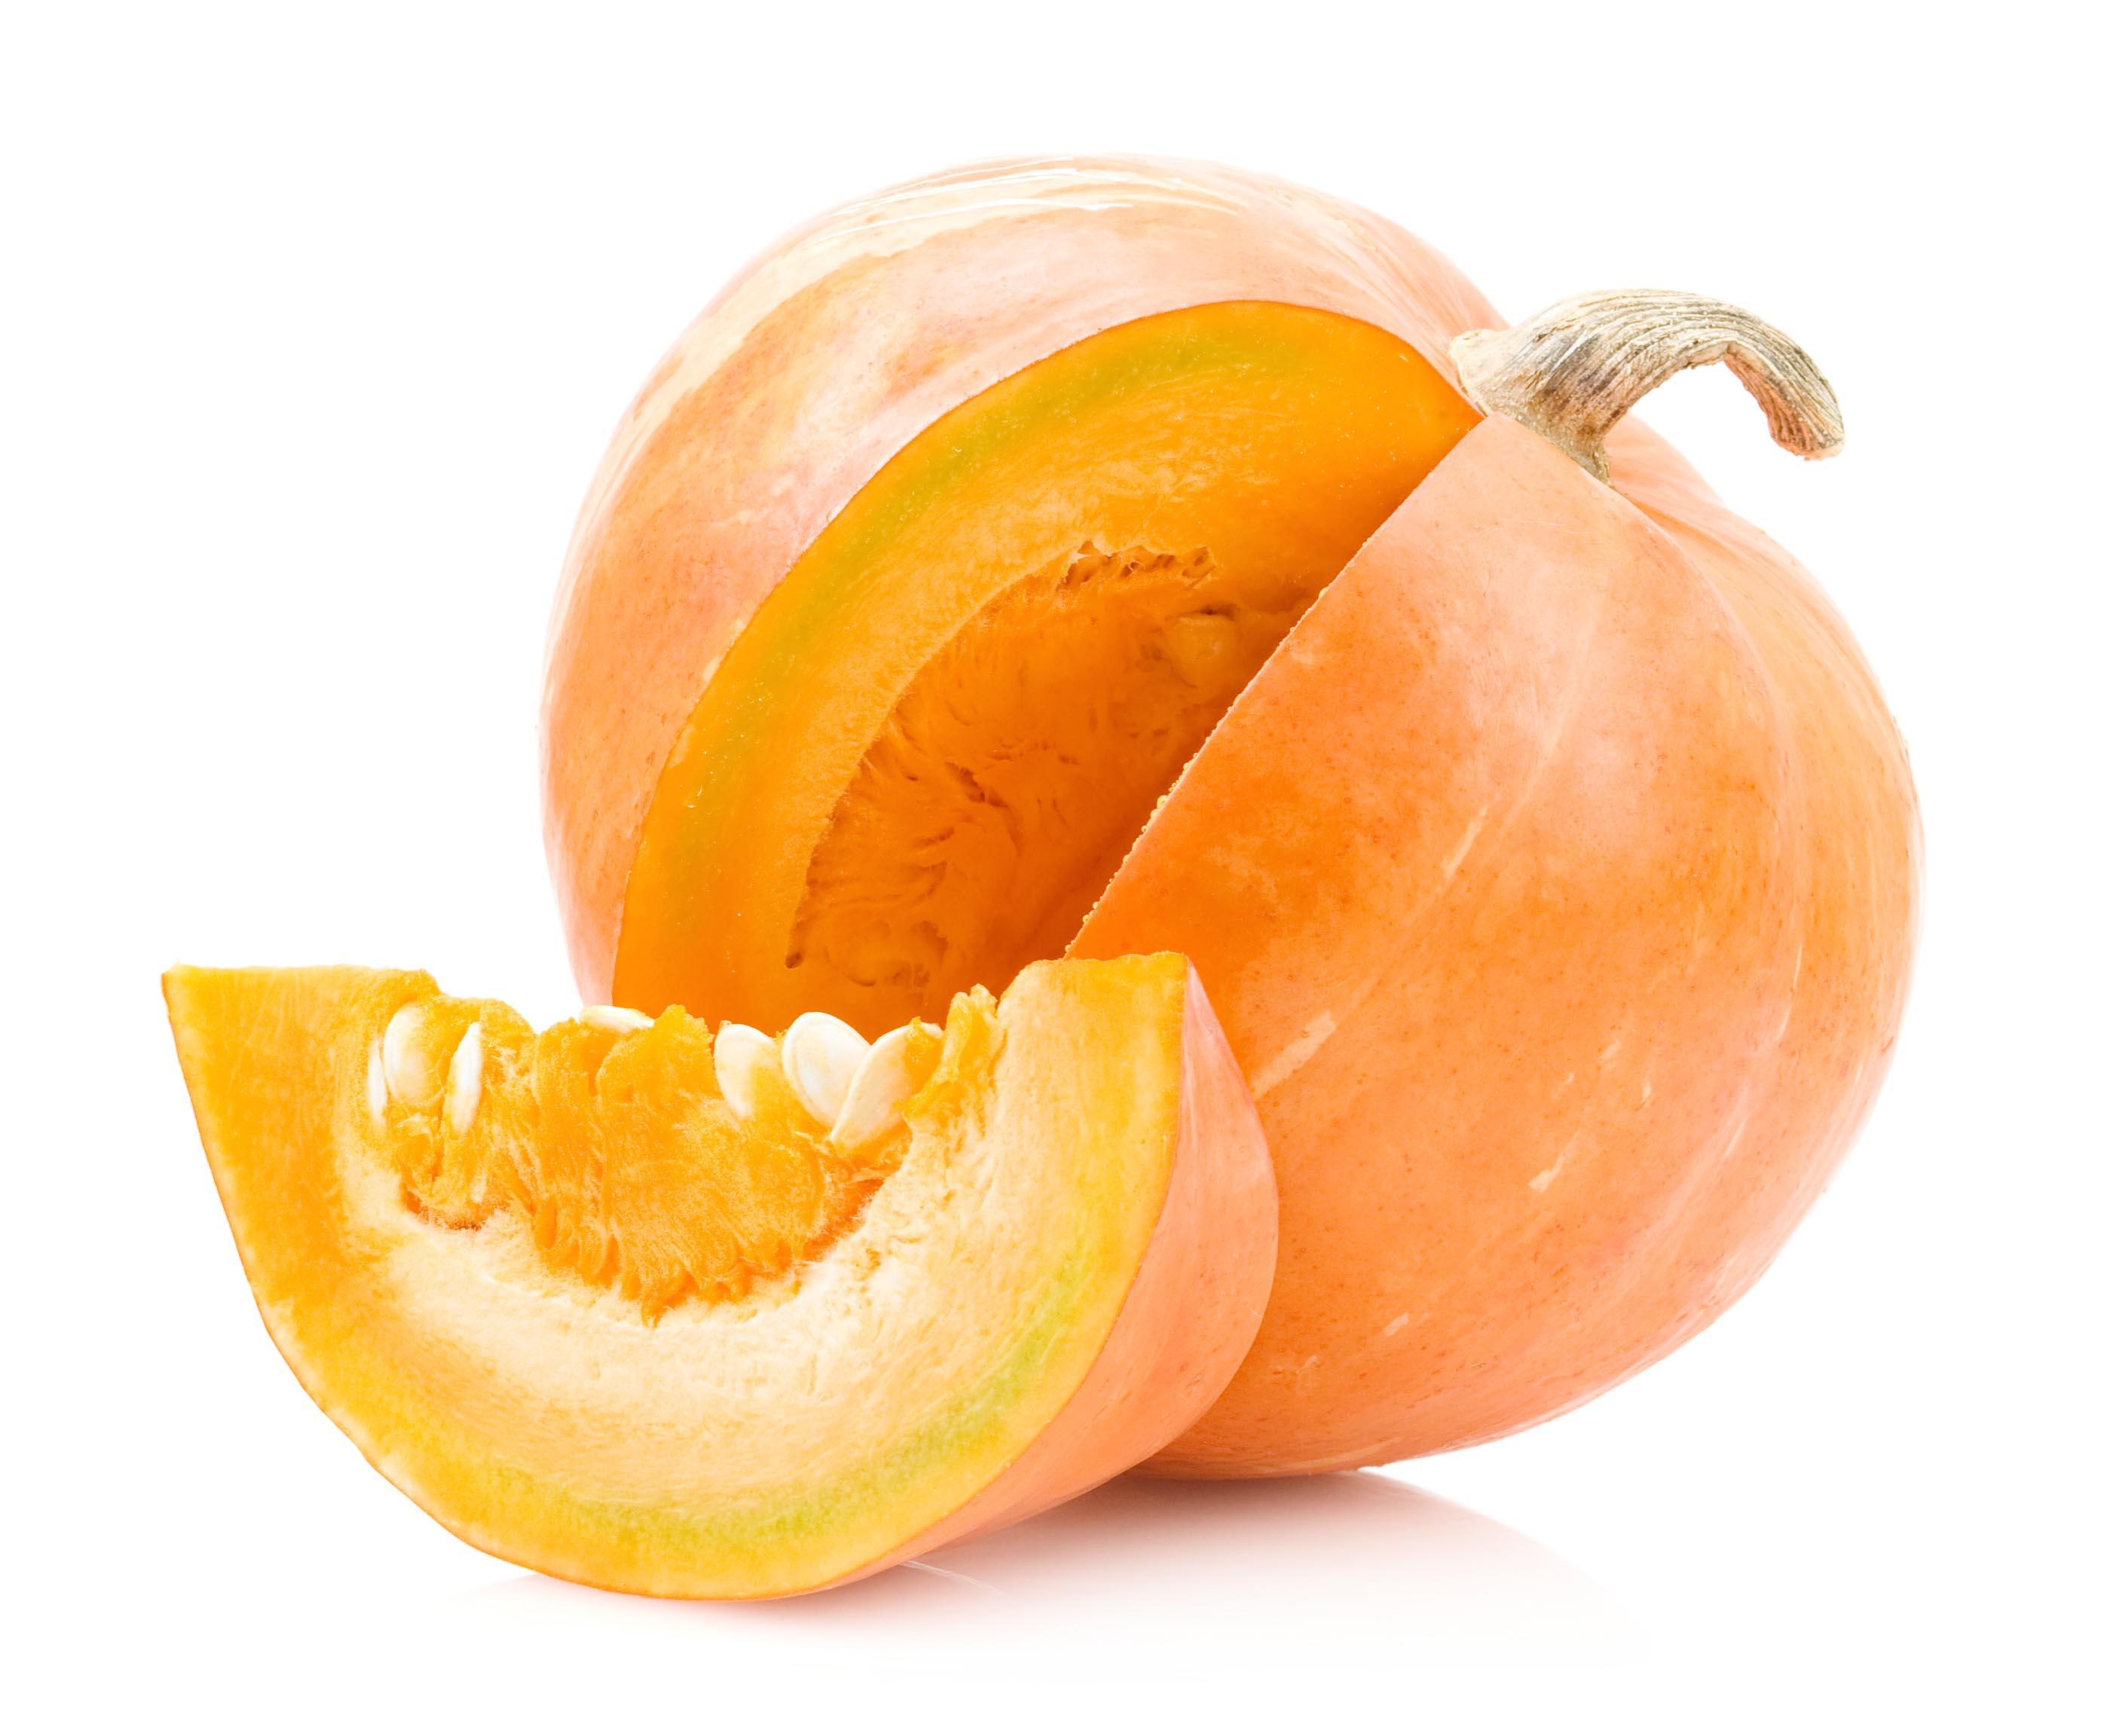 Pumpkin on white, Agriculture, Seasonal, One, Orange, HQ Photo